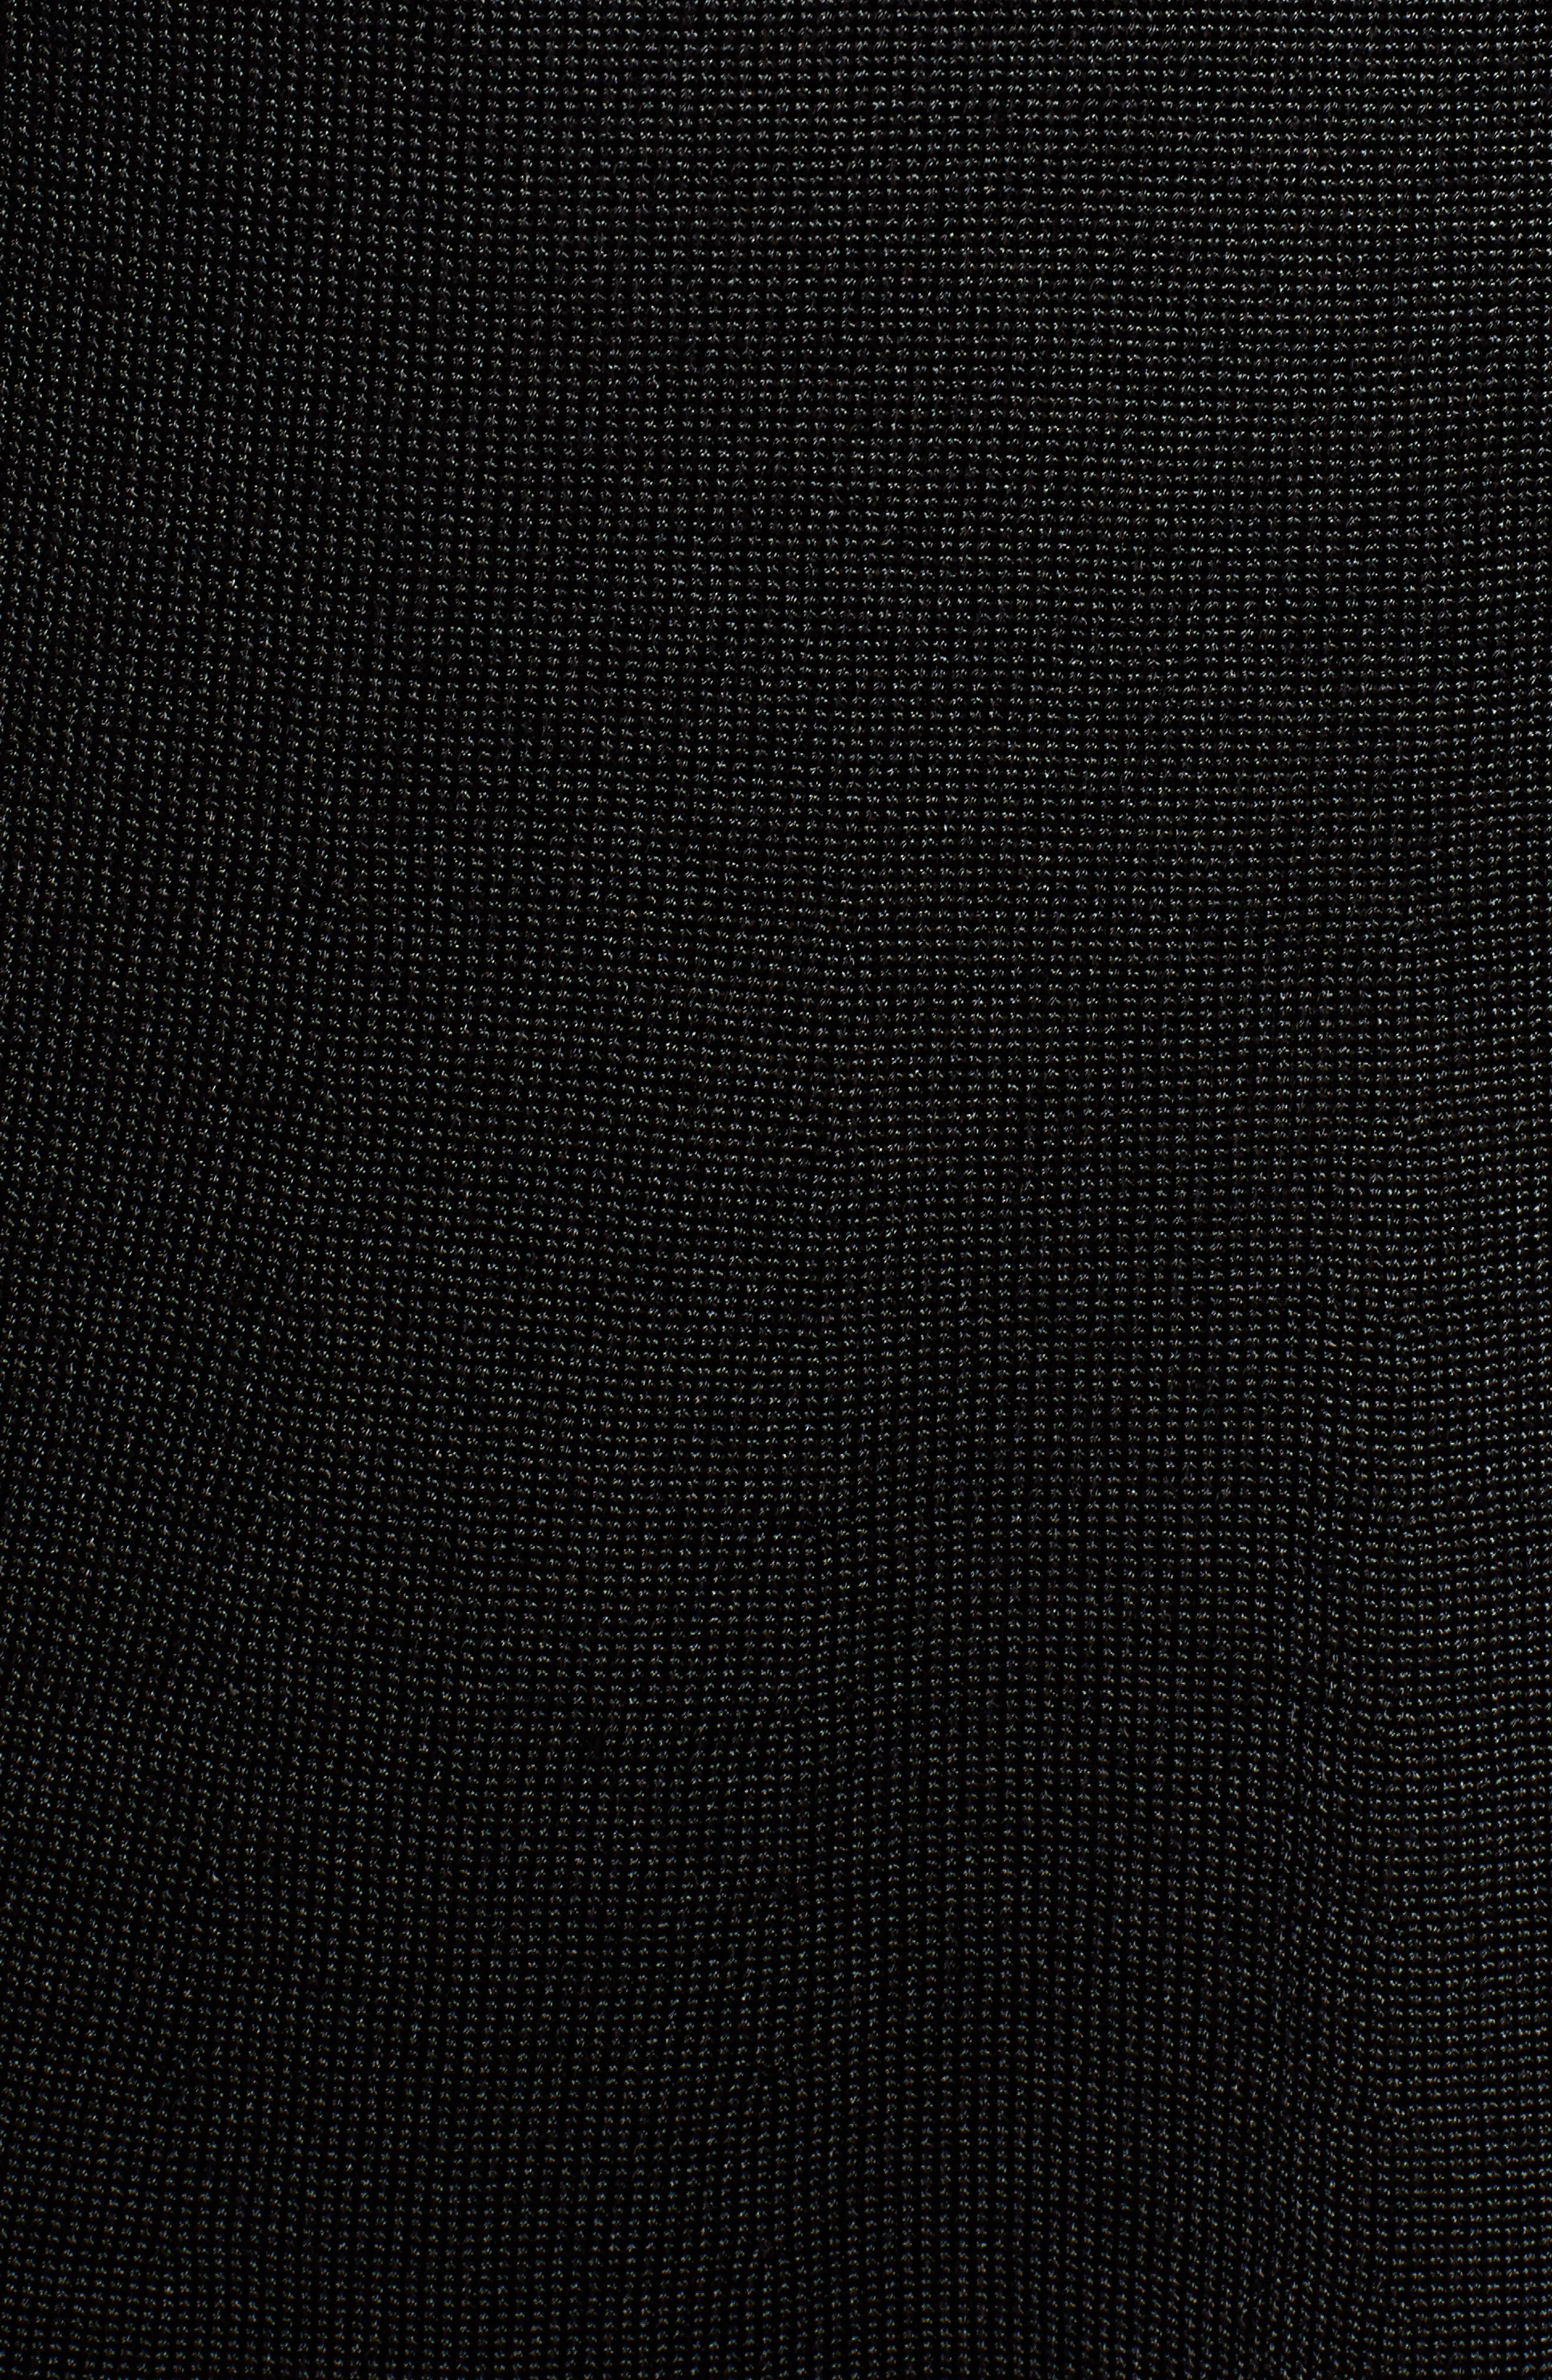 Fil Coupé Mixed Media Dress,                             Alternate thumbnail 6, color,                             RICH BLACK